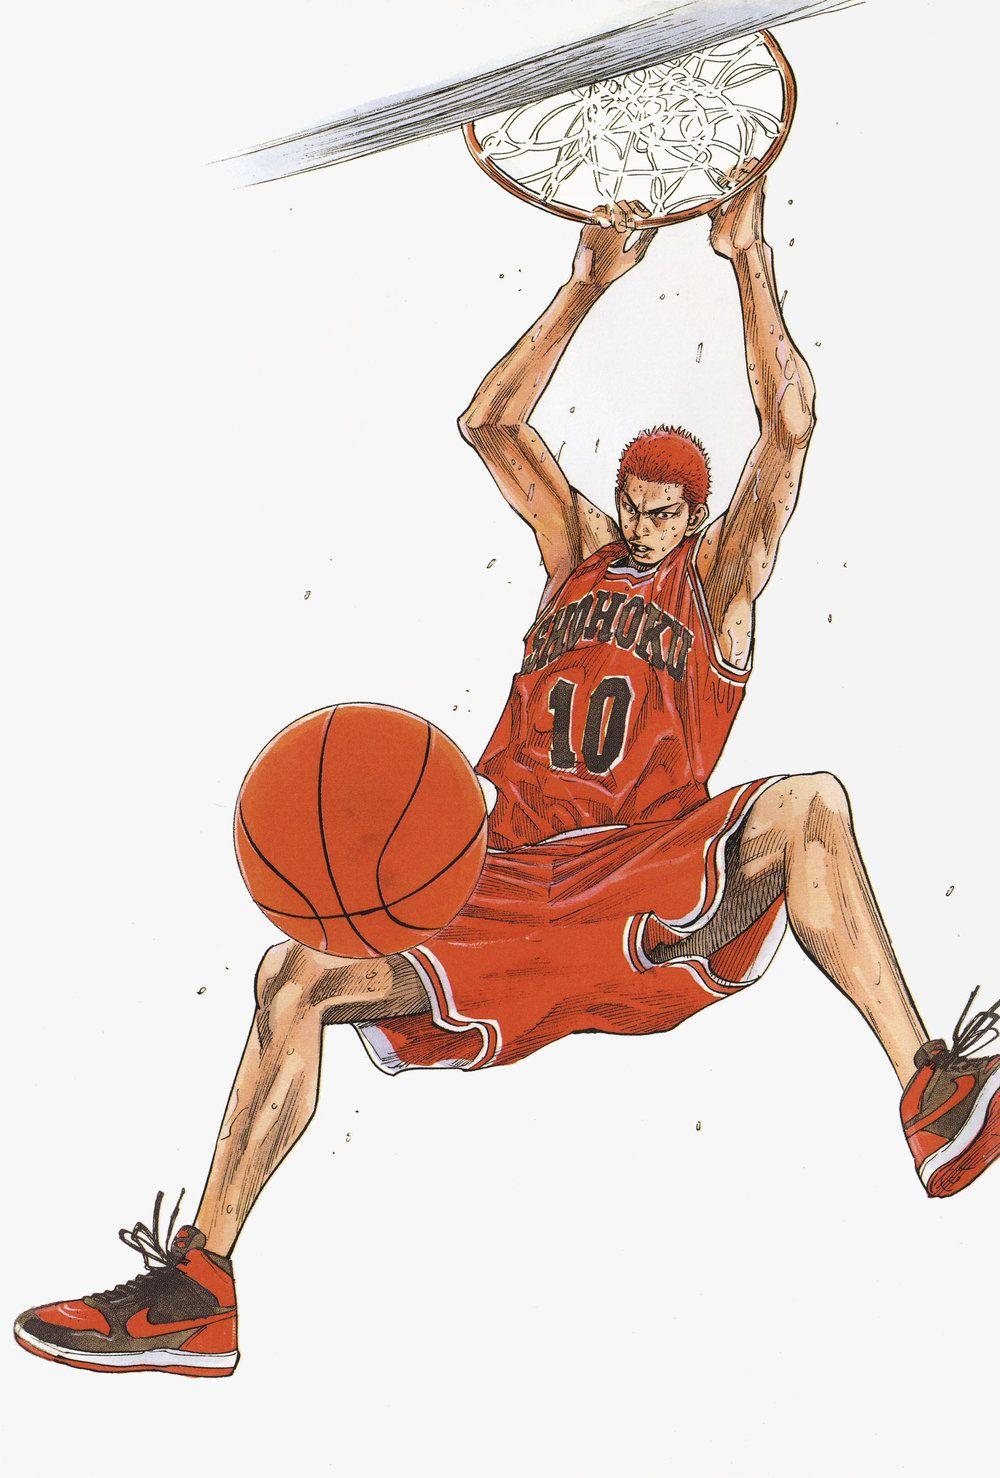 Art of Slam Dunk Slam dunk manga, Slam dunk anime, Slam dunk